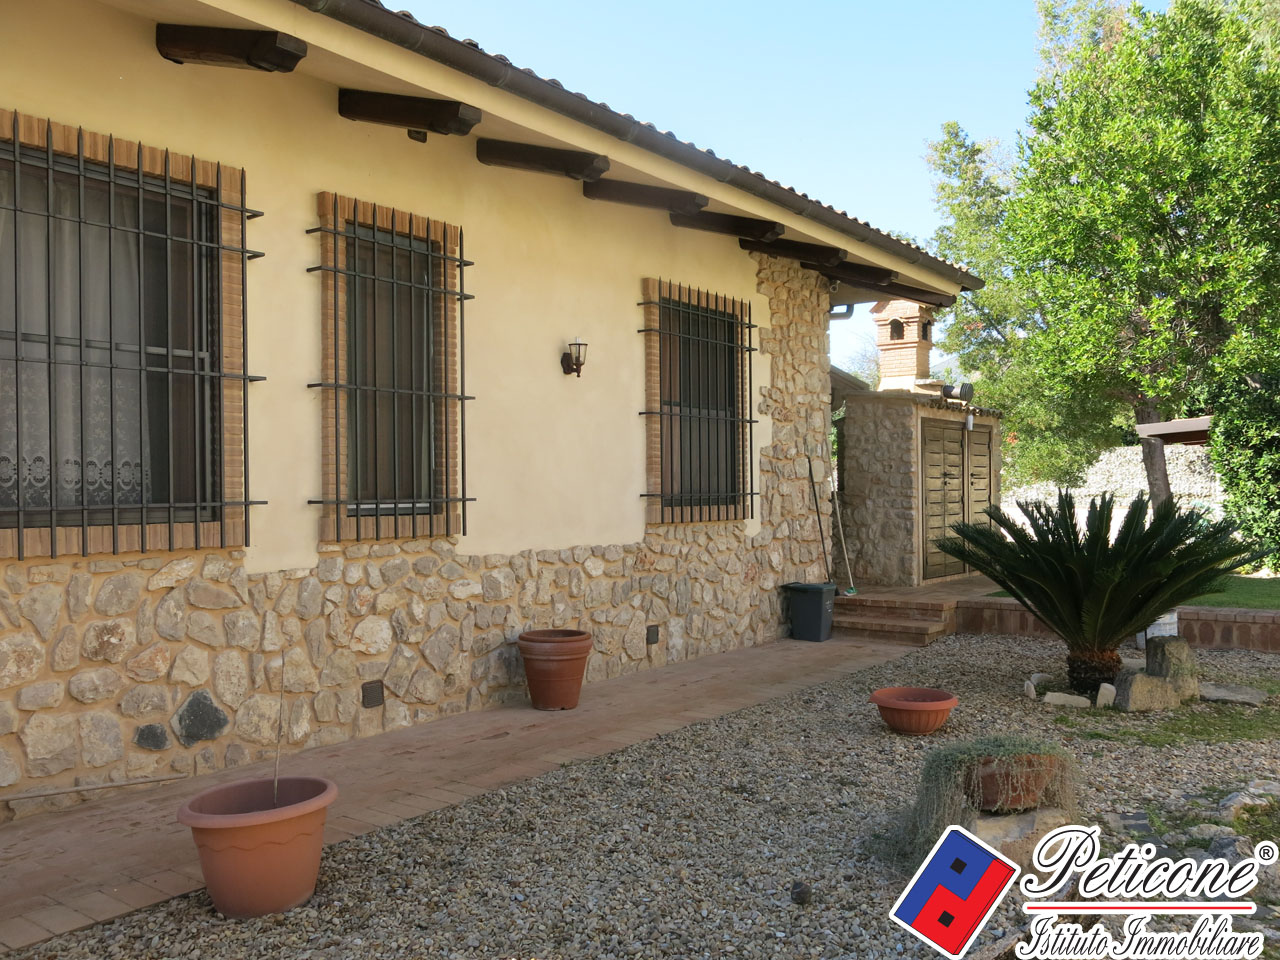 Villa in Vendita a Fondi: 3 locali, 107 mq - Foto 25